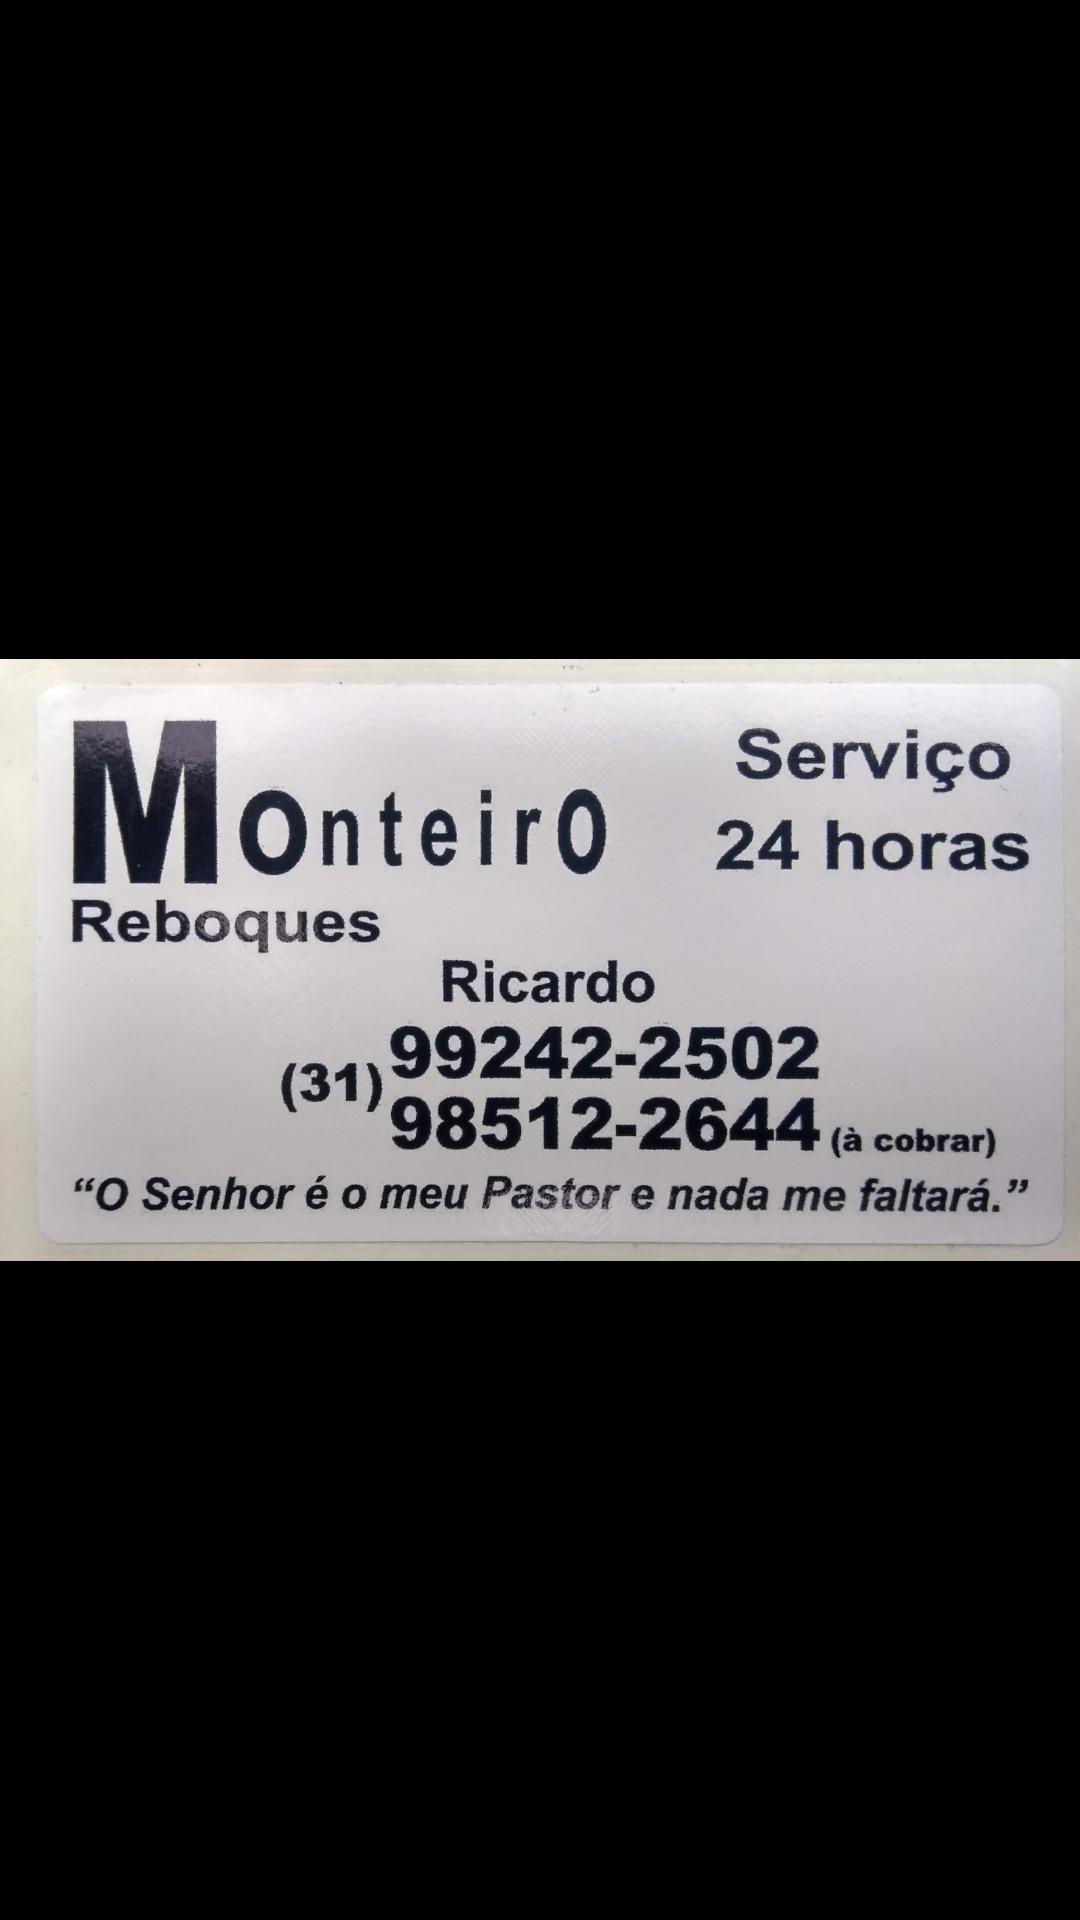 MONTEIRO REBOQUES